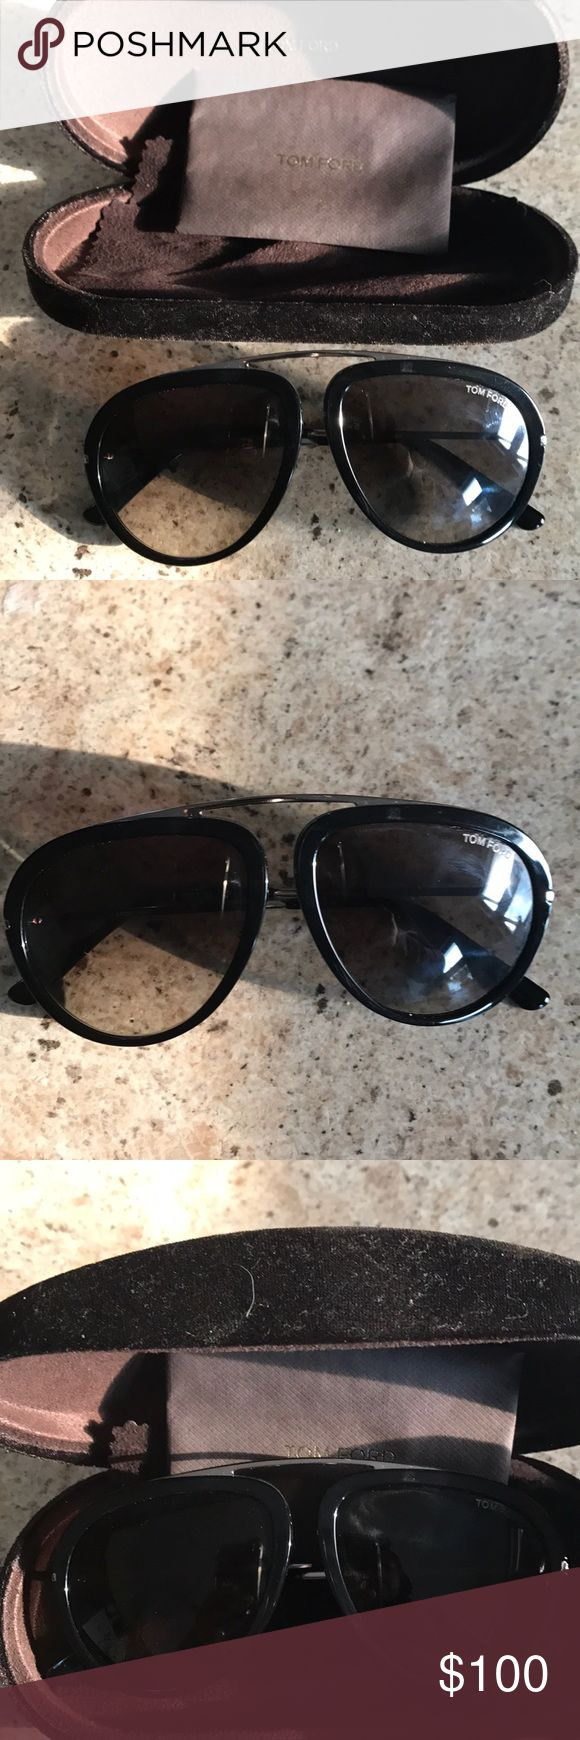 Tom ford women's sunglasses Tom Ford sunglasses very classy !! Tom Ford Accessories Sunglasses